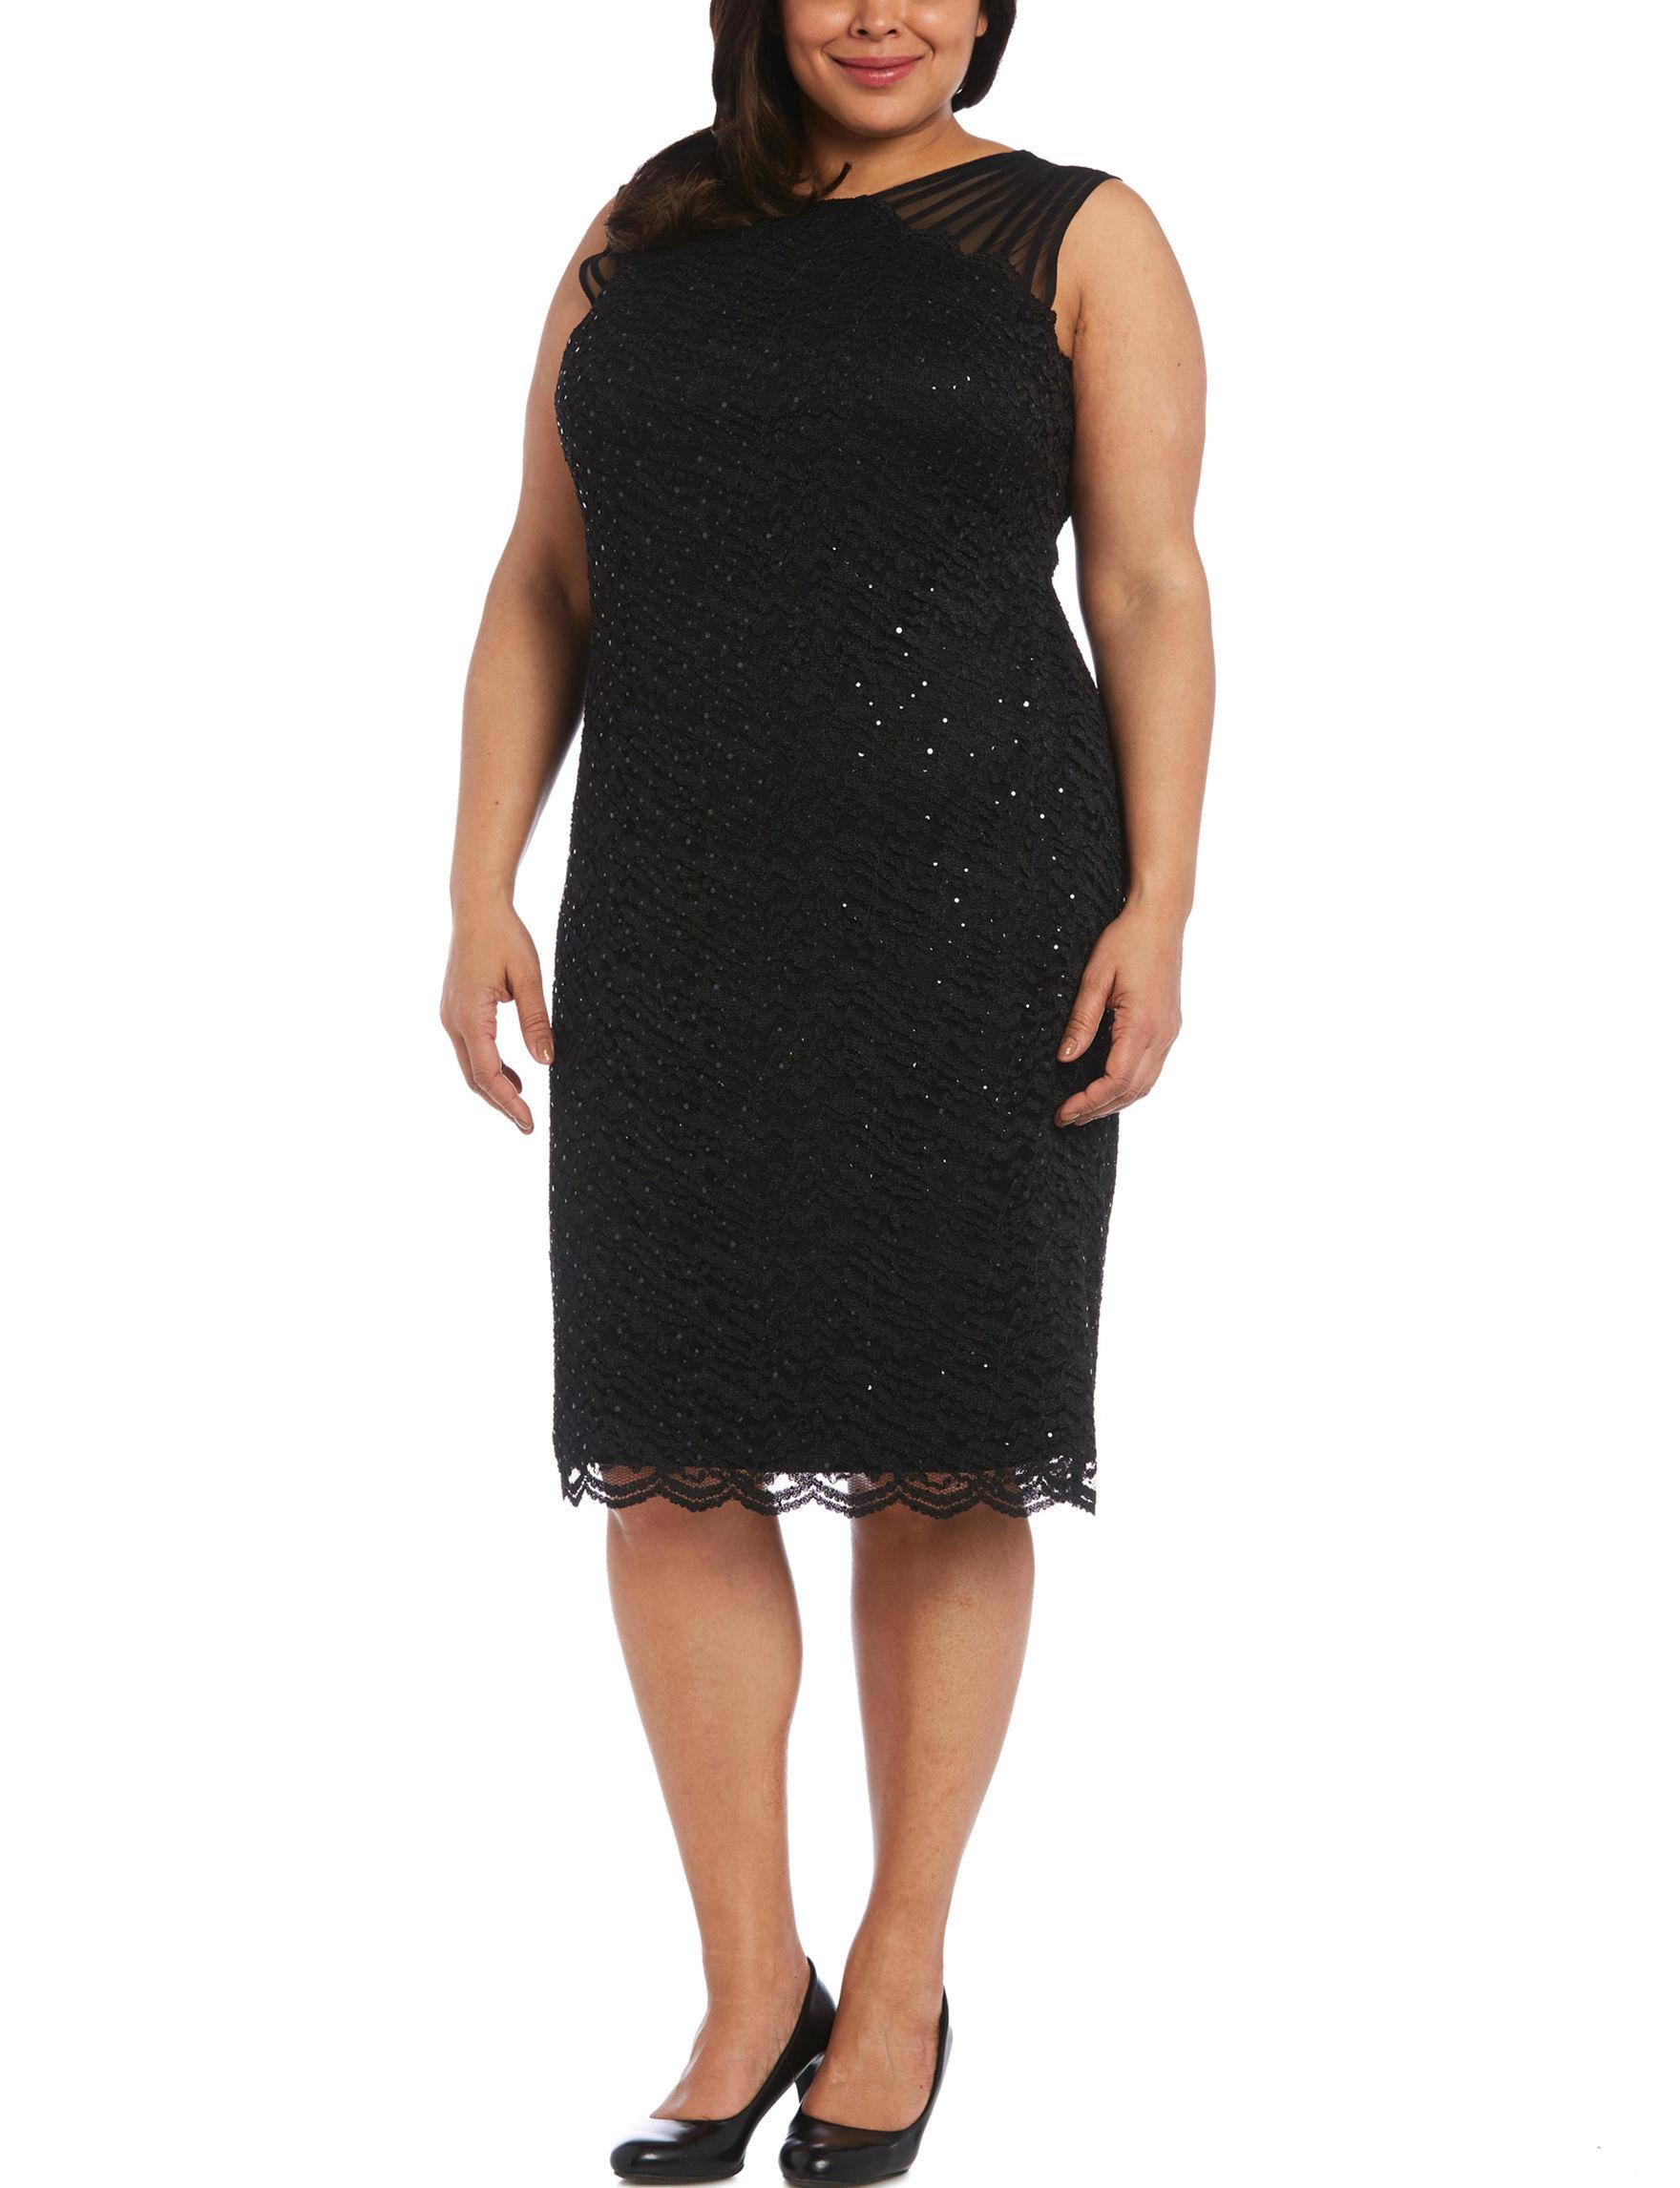 Nightway Black Evening & Formal Sheath Dresses